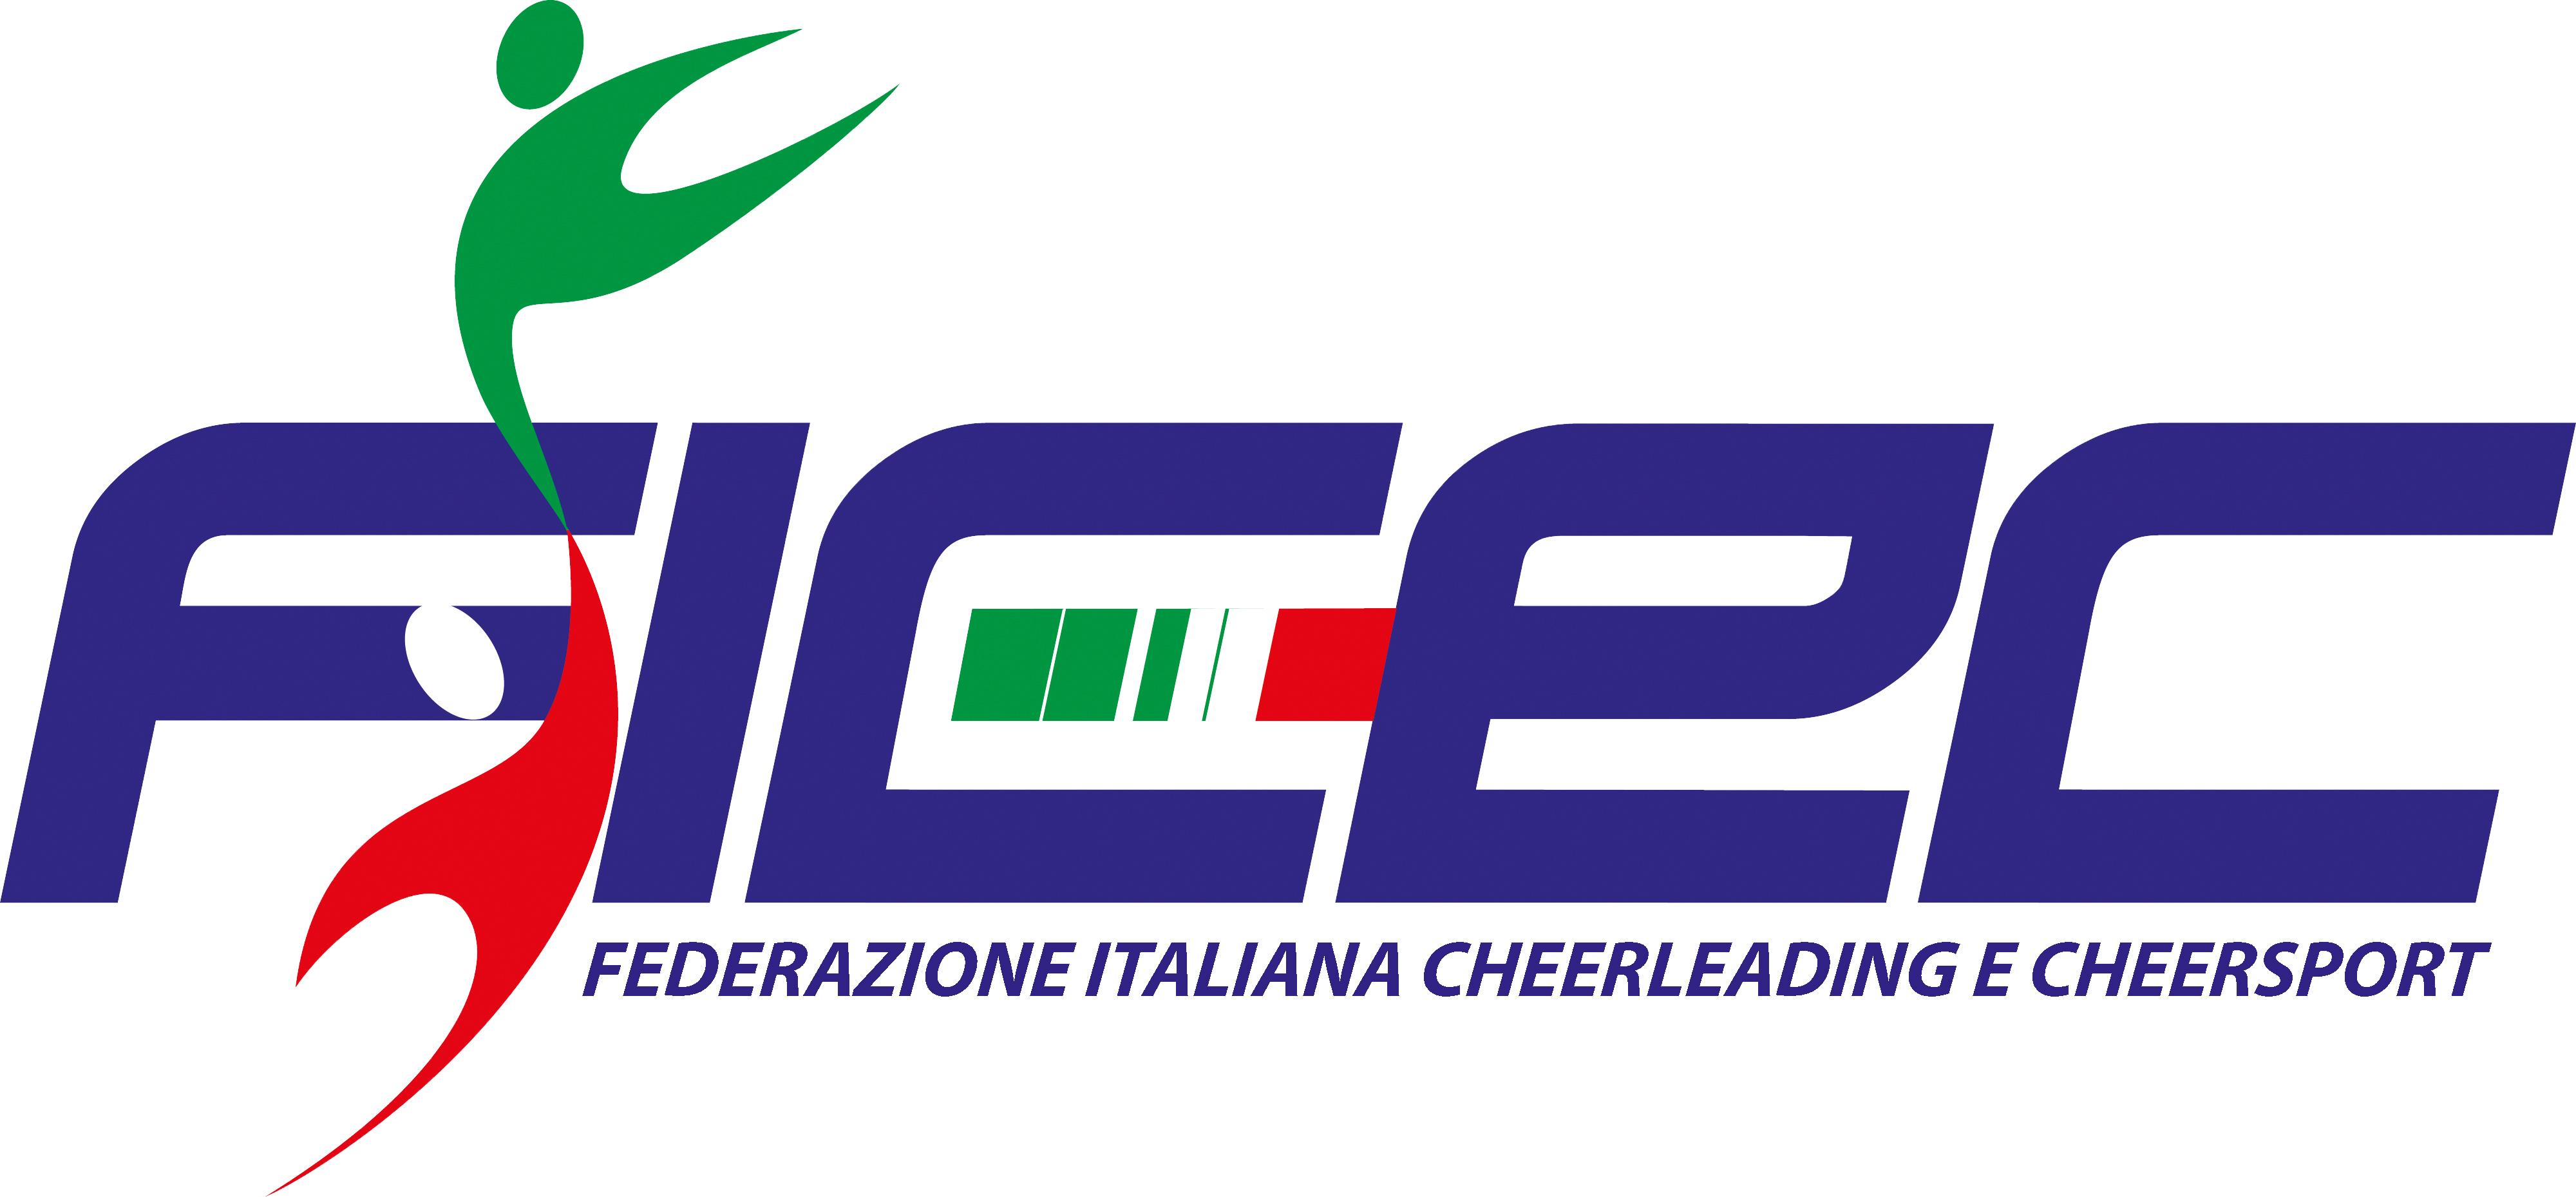 Ficec new 2018 logo cheersport 2018-05-17 (2) (2)